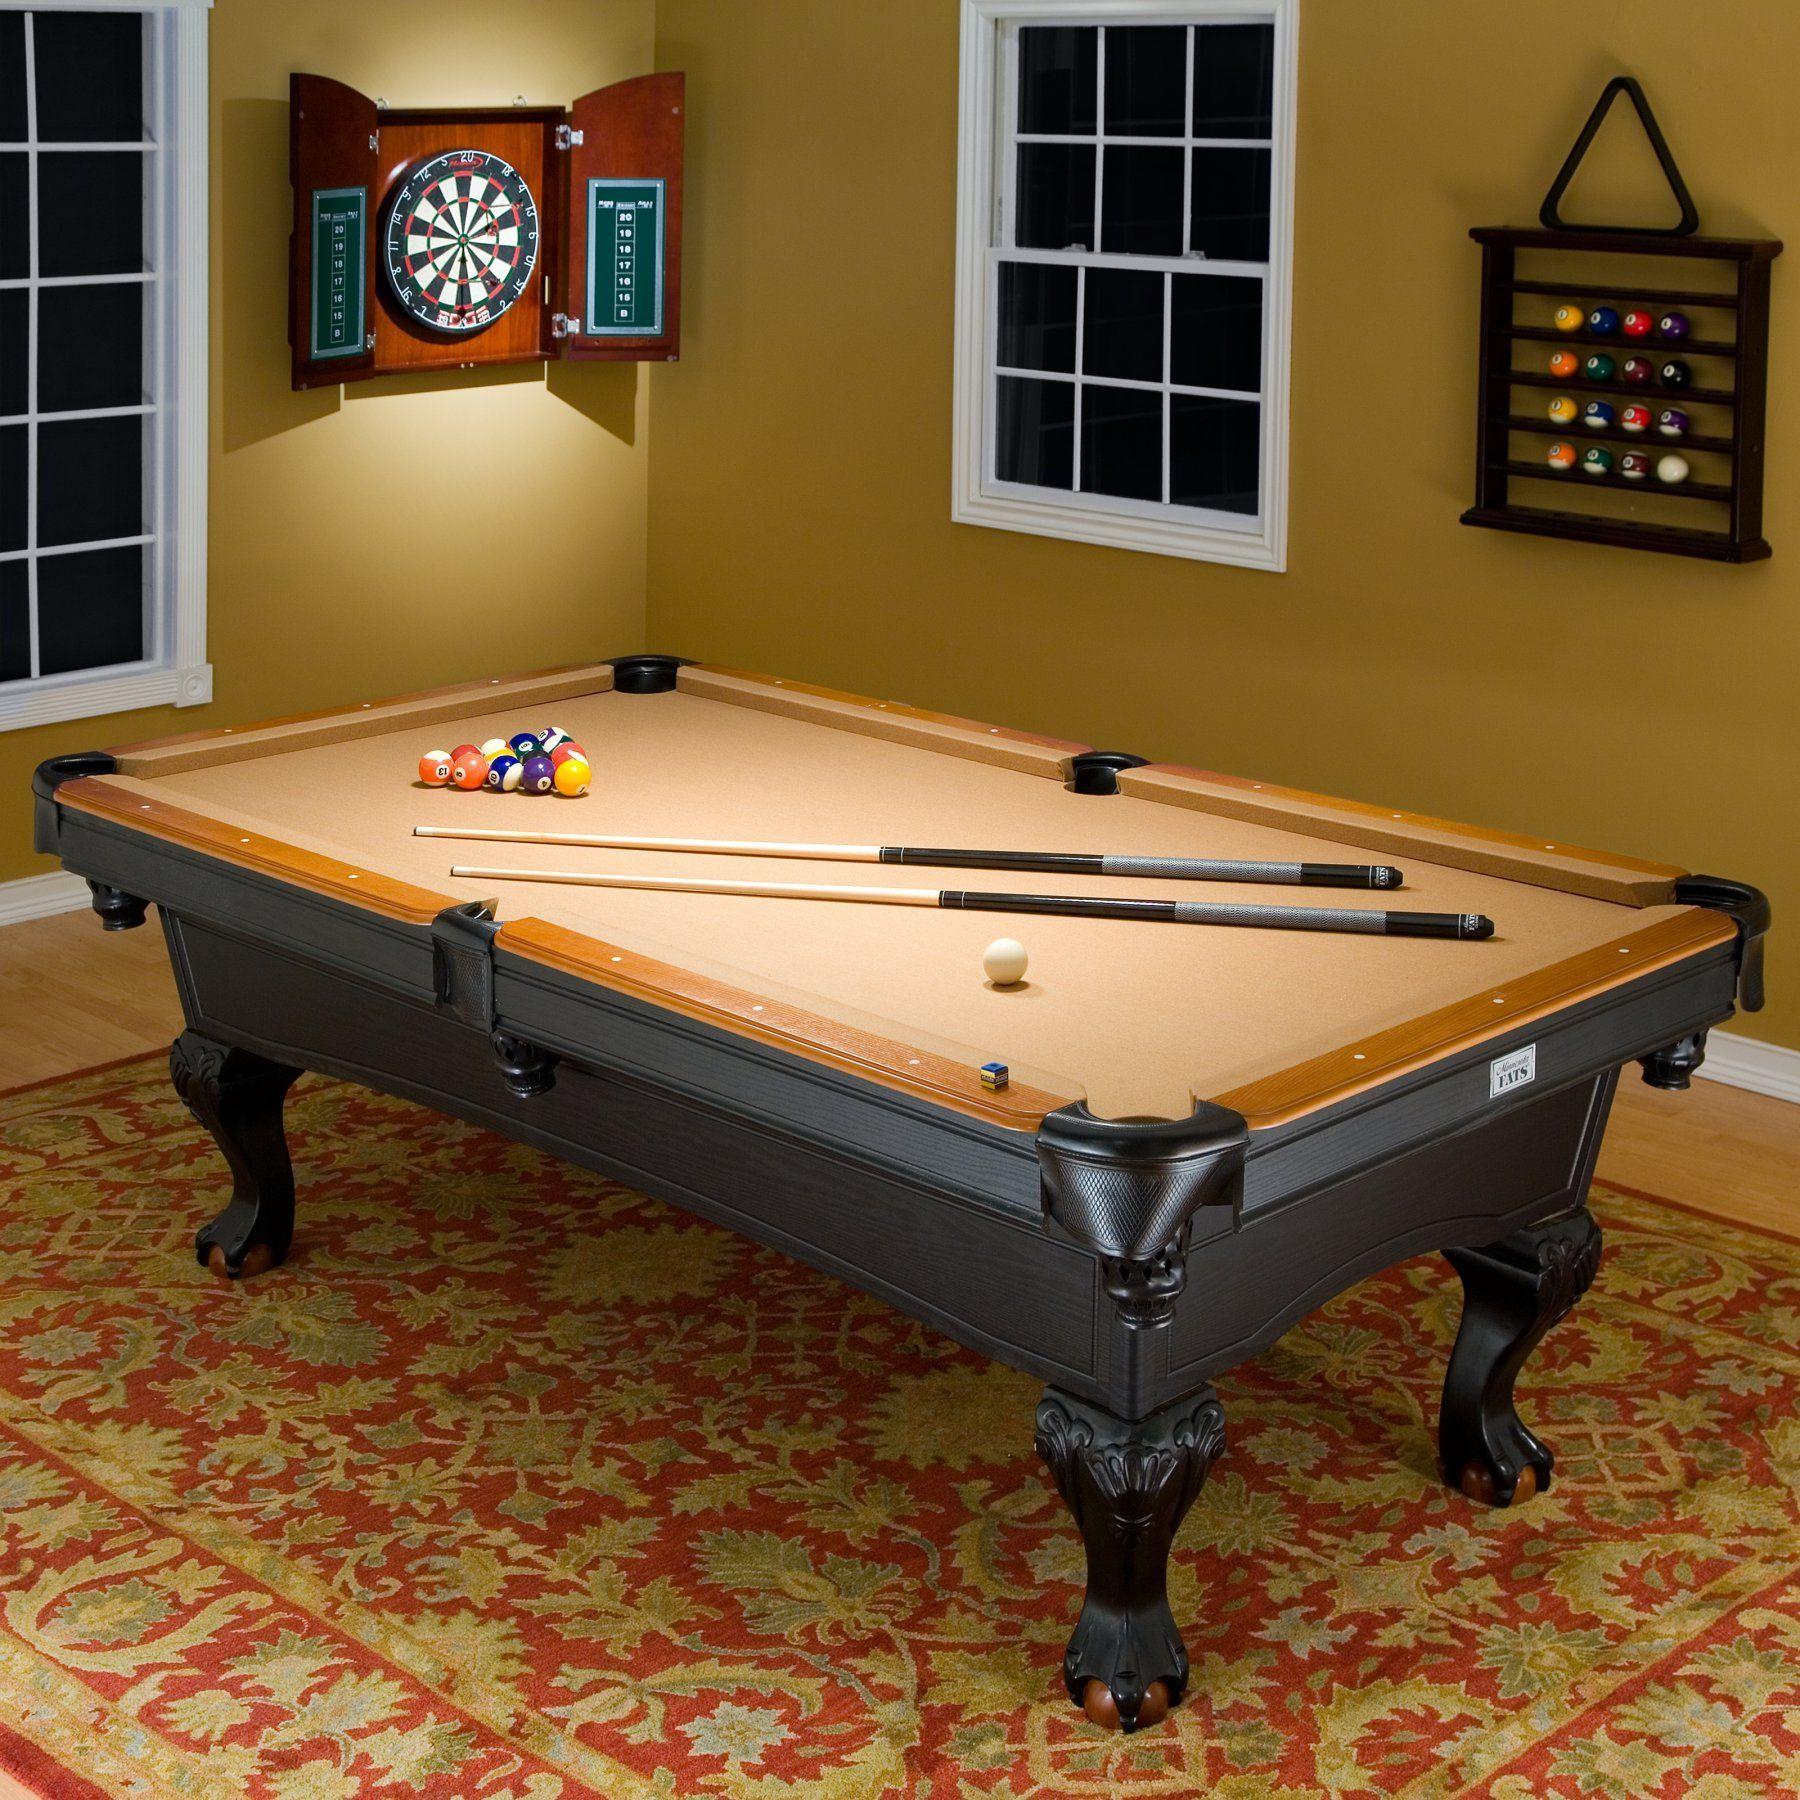 Minnesota fats ft covington billiard table mfttbl